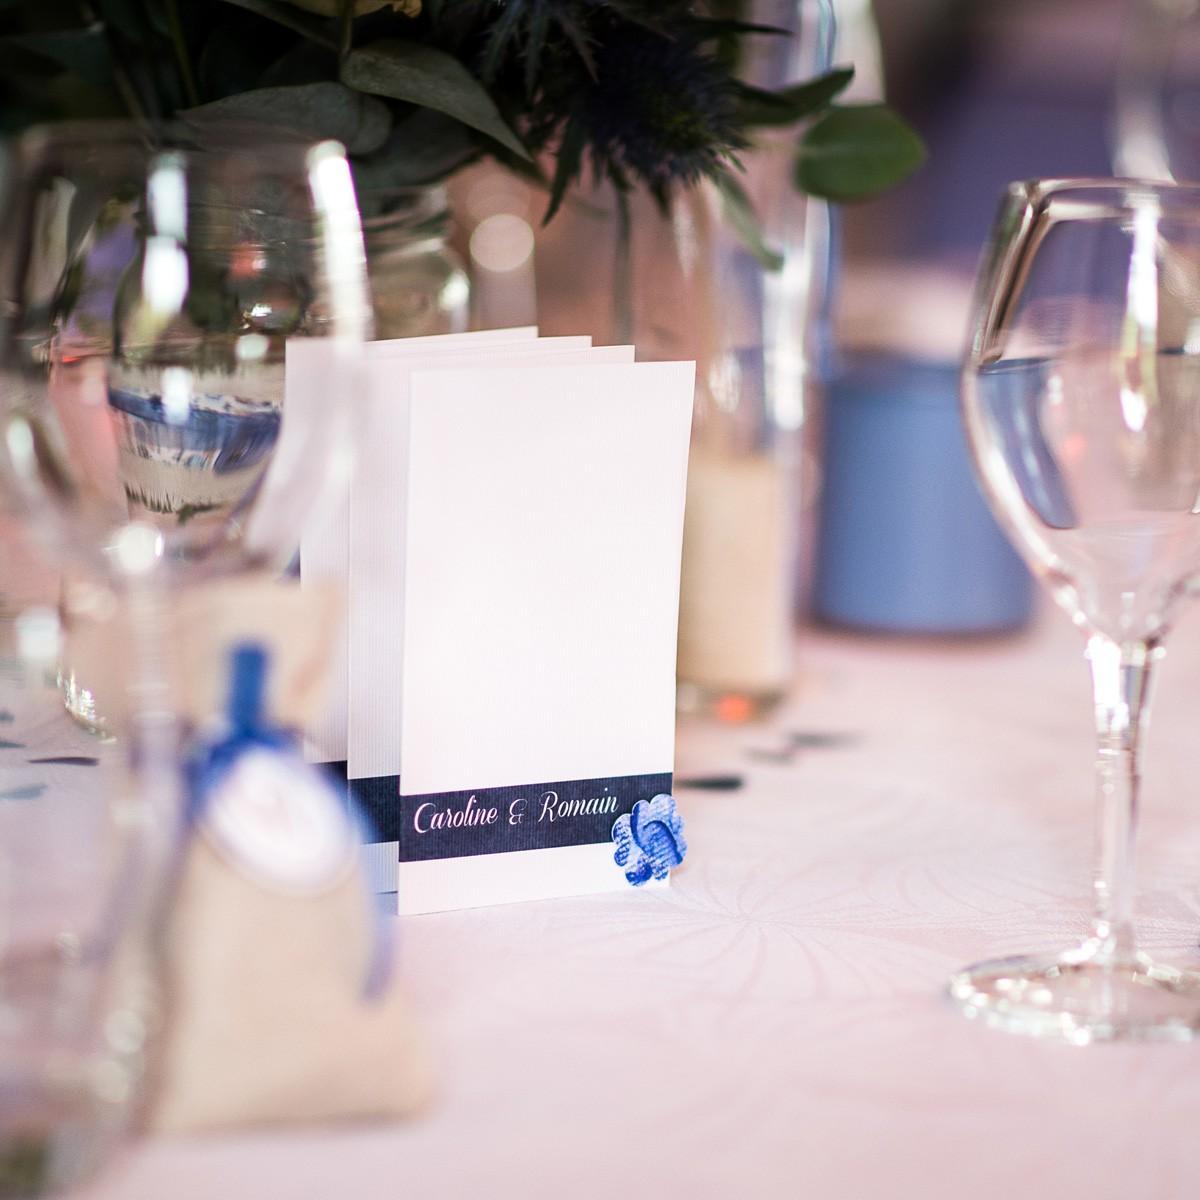 faire-part-mariage-bretagne-bleu-blanc-hortensia-papeterie-personnalisee-helene-ripoll-menu-accordeon